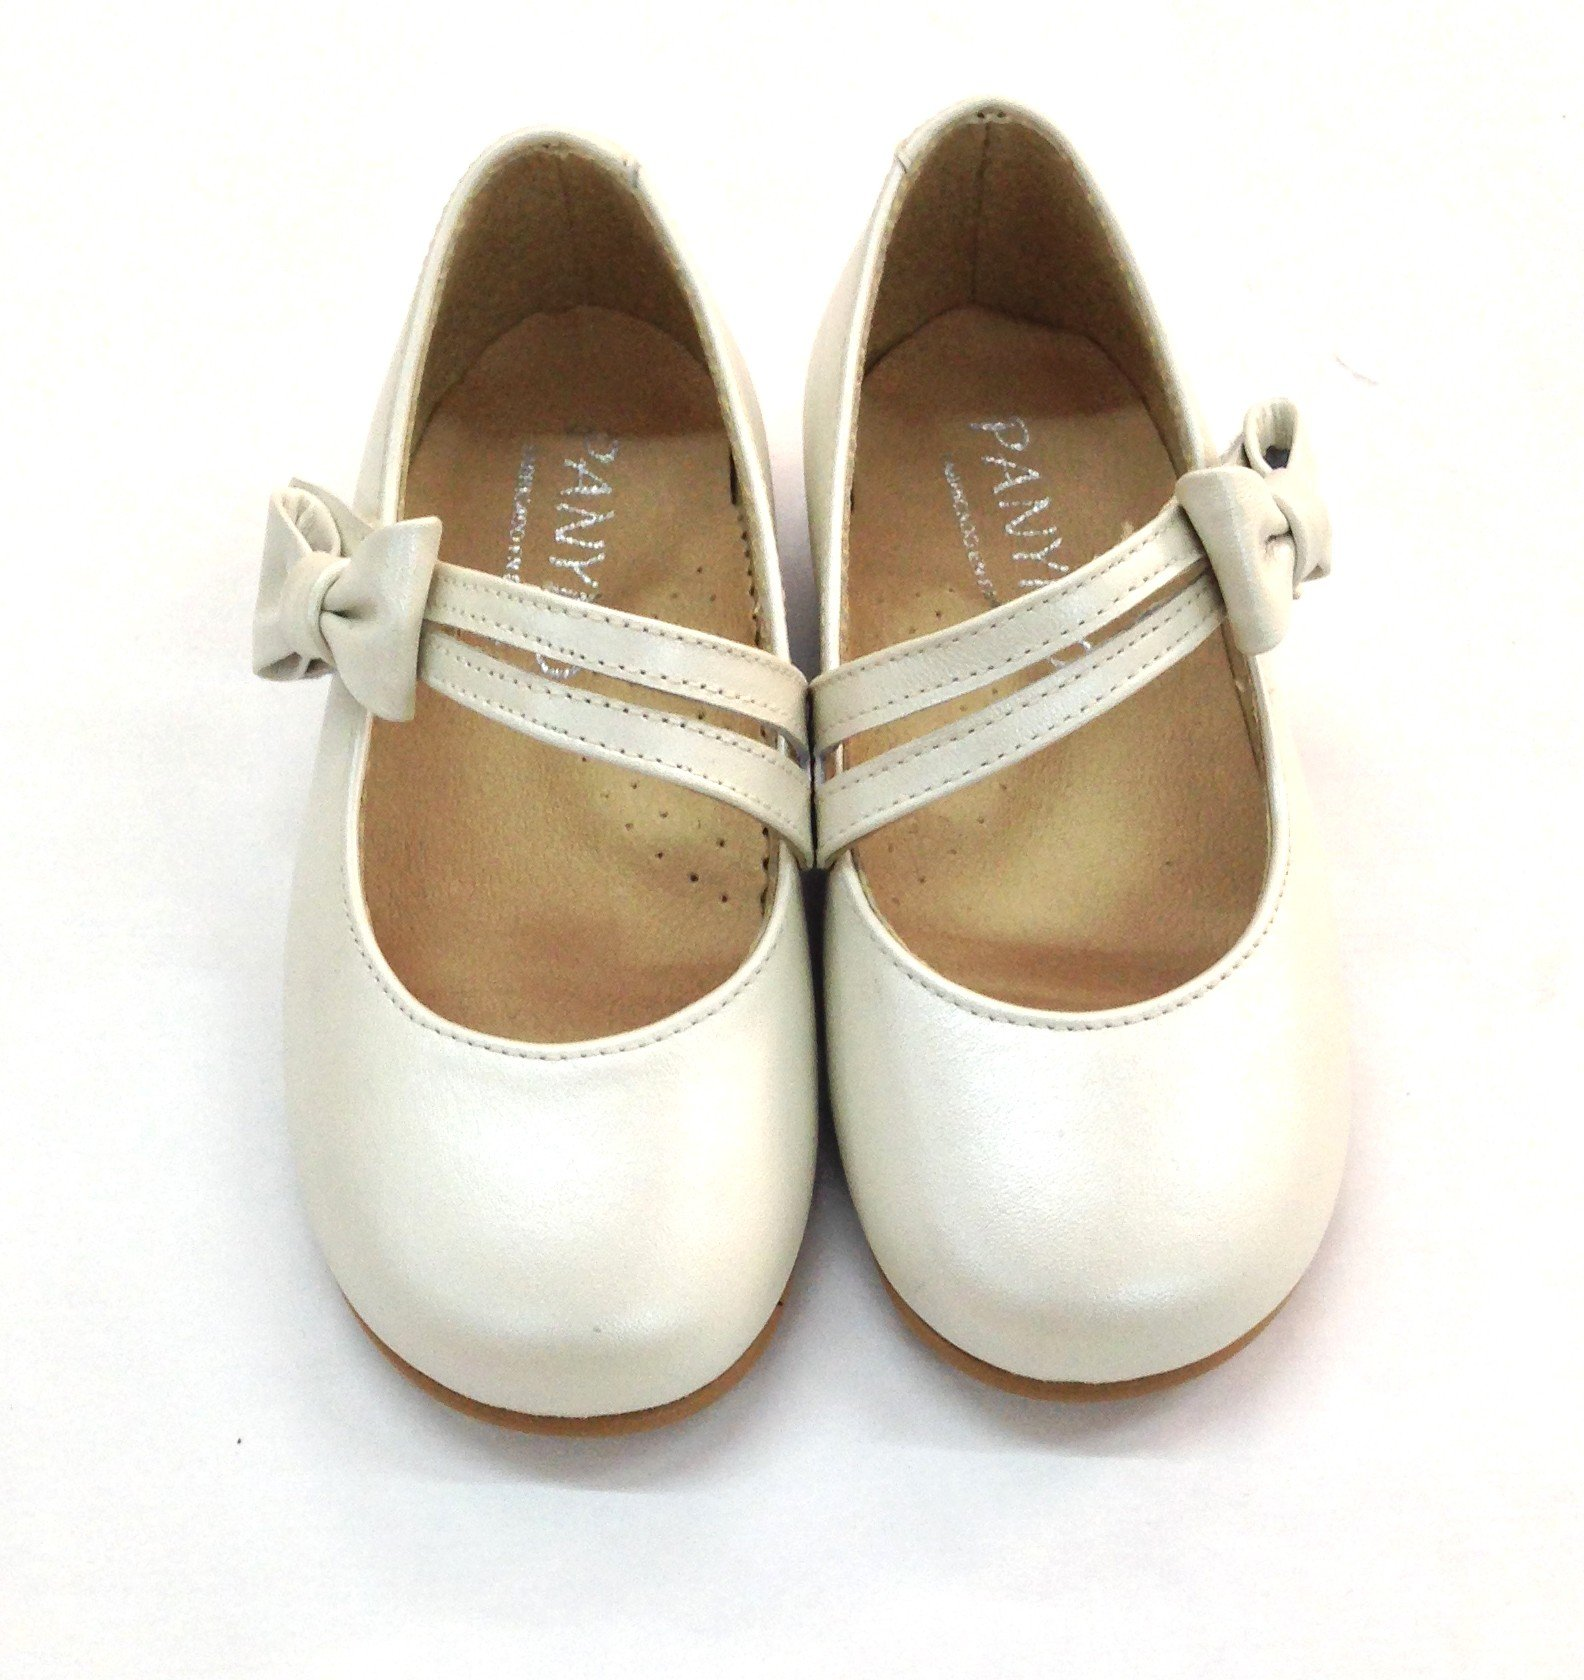 38b0e580a Zapato niña merceditas lazo - Arca Boutique Infantil-Juvenil